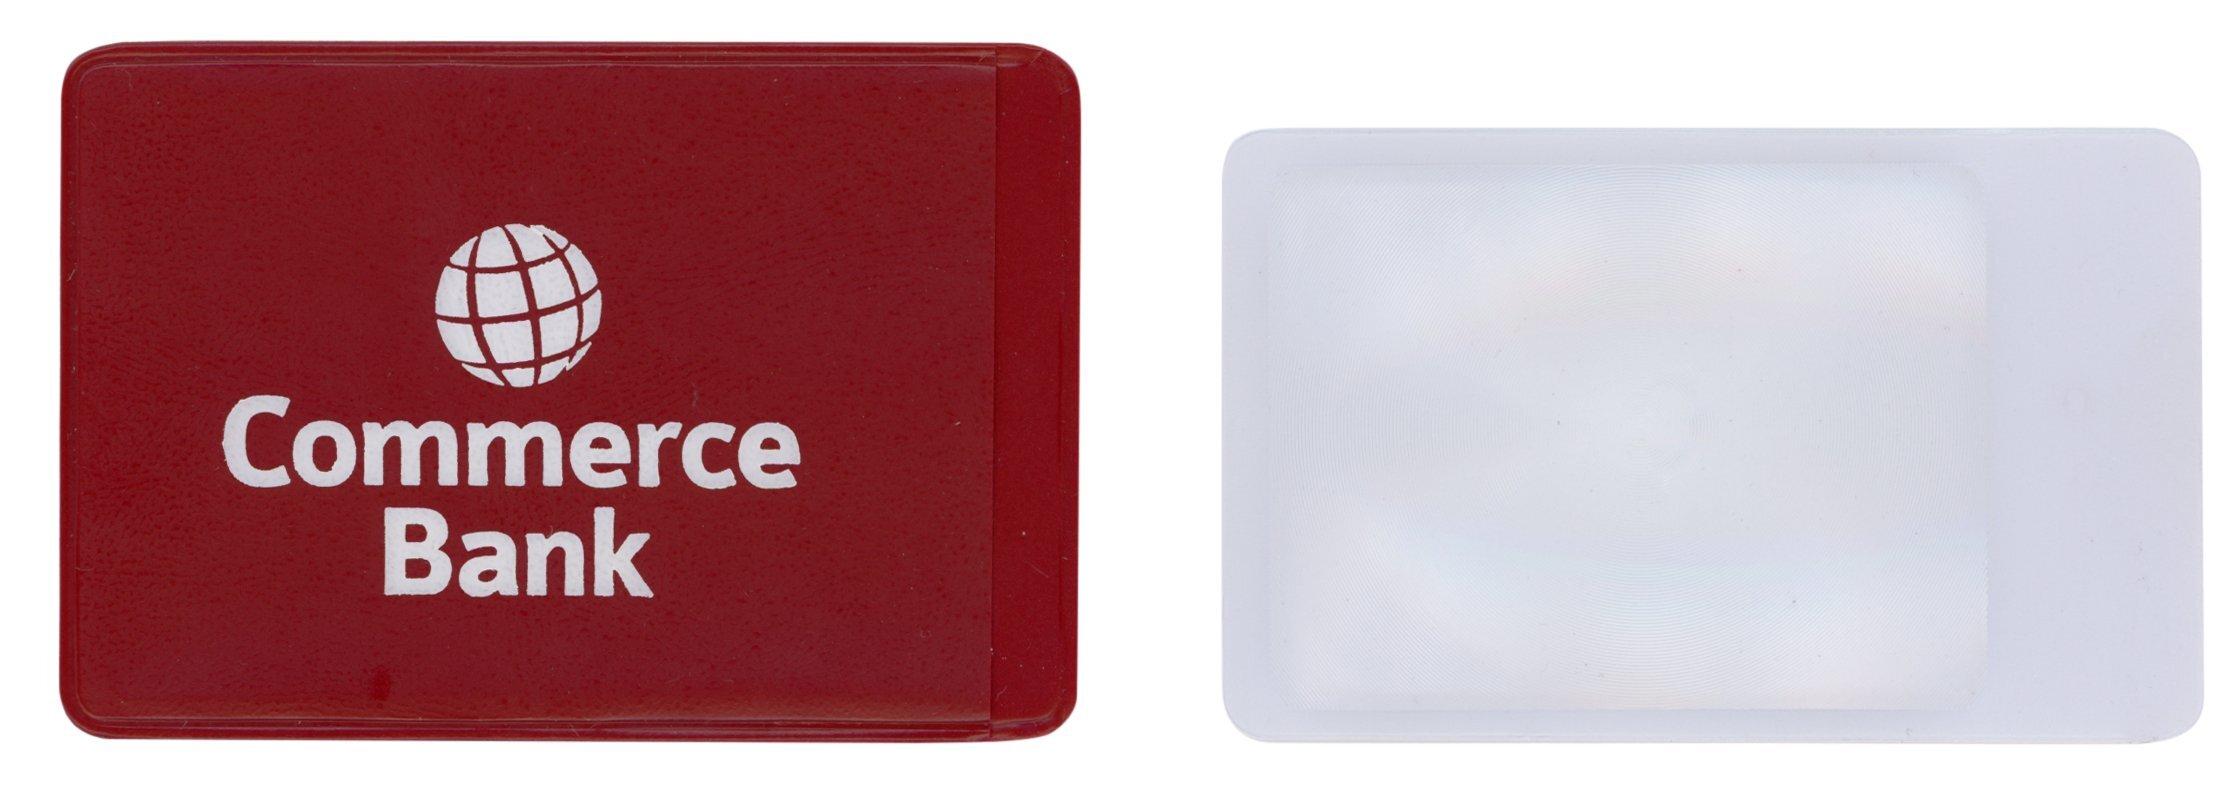 Credit Card Magnifier in a Vinyl Case